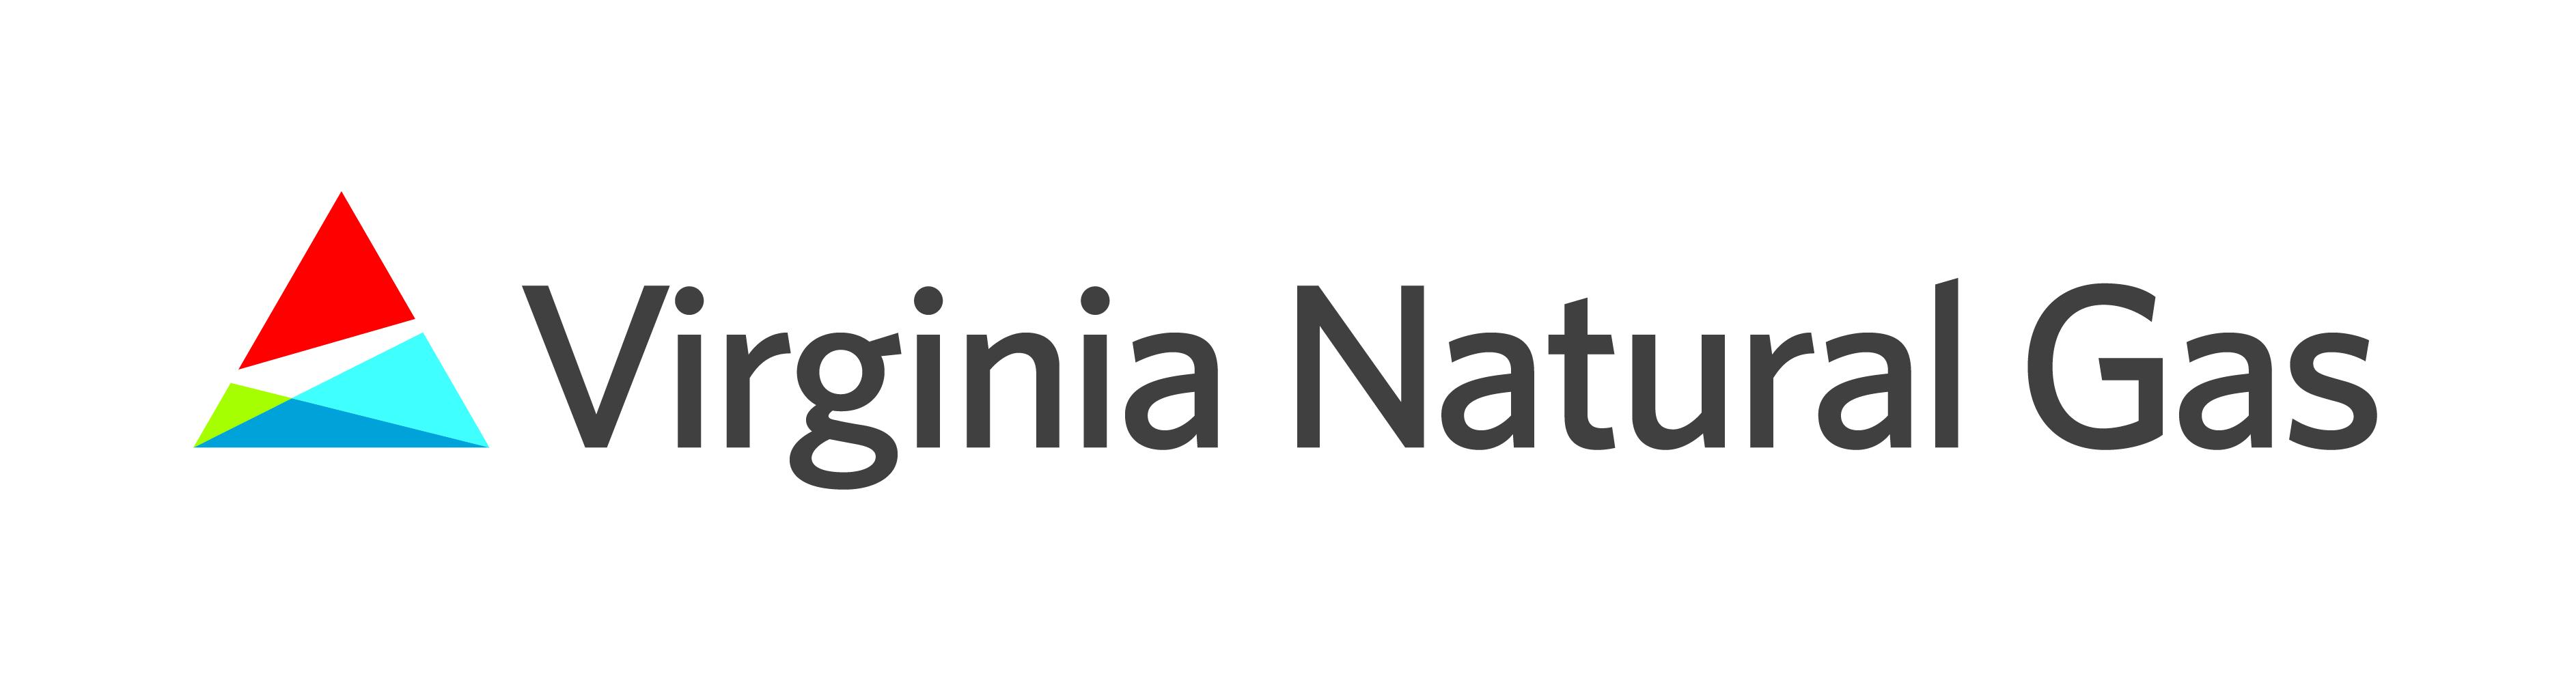 Virginia Natural Gas